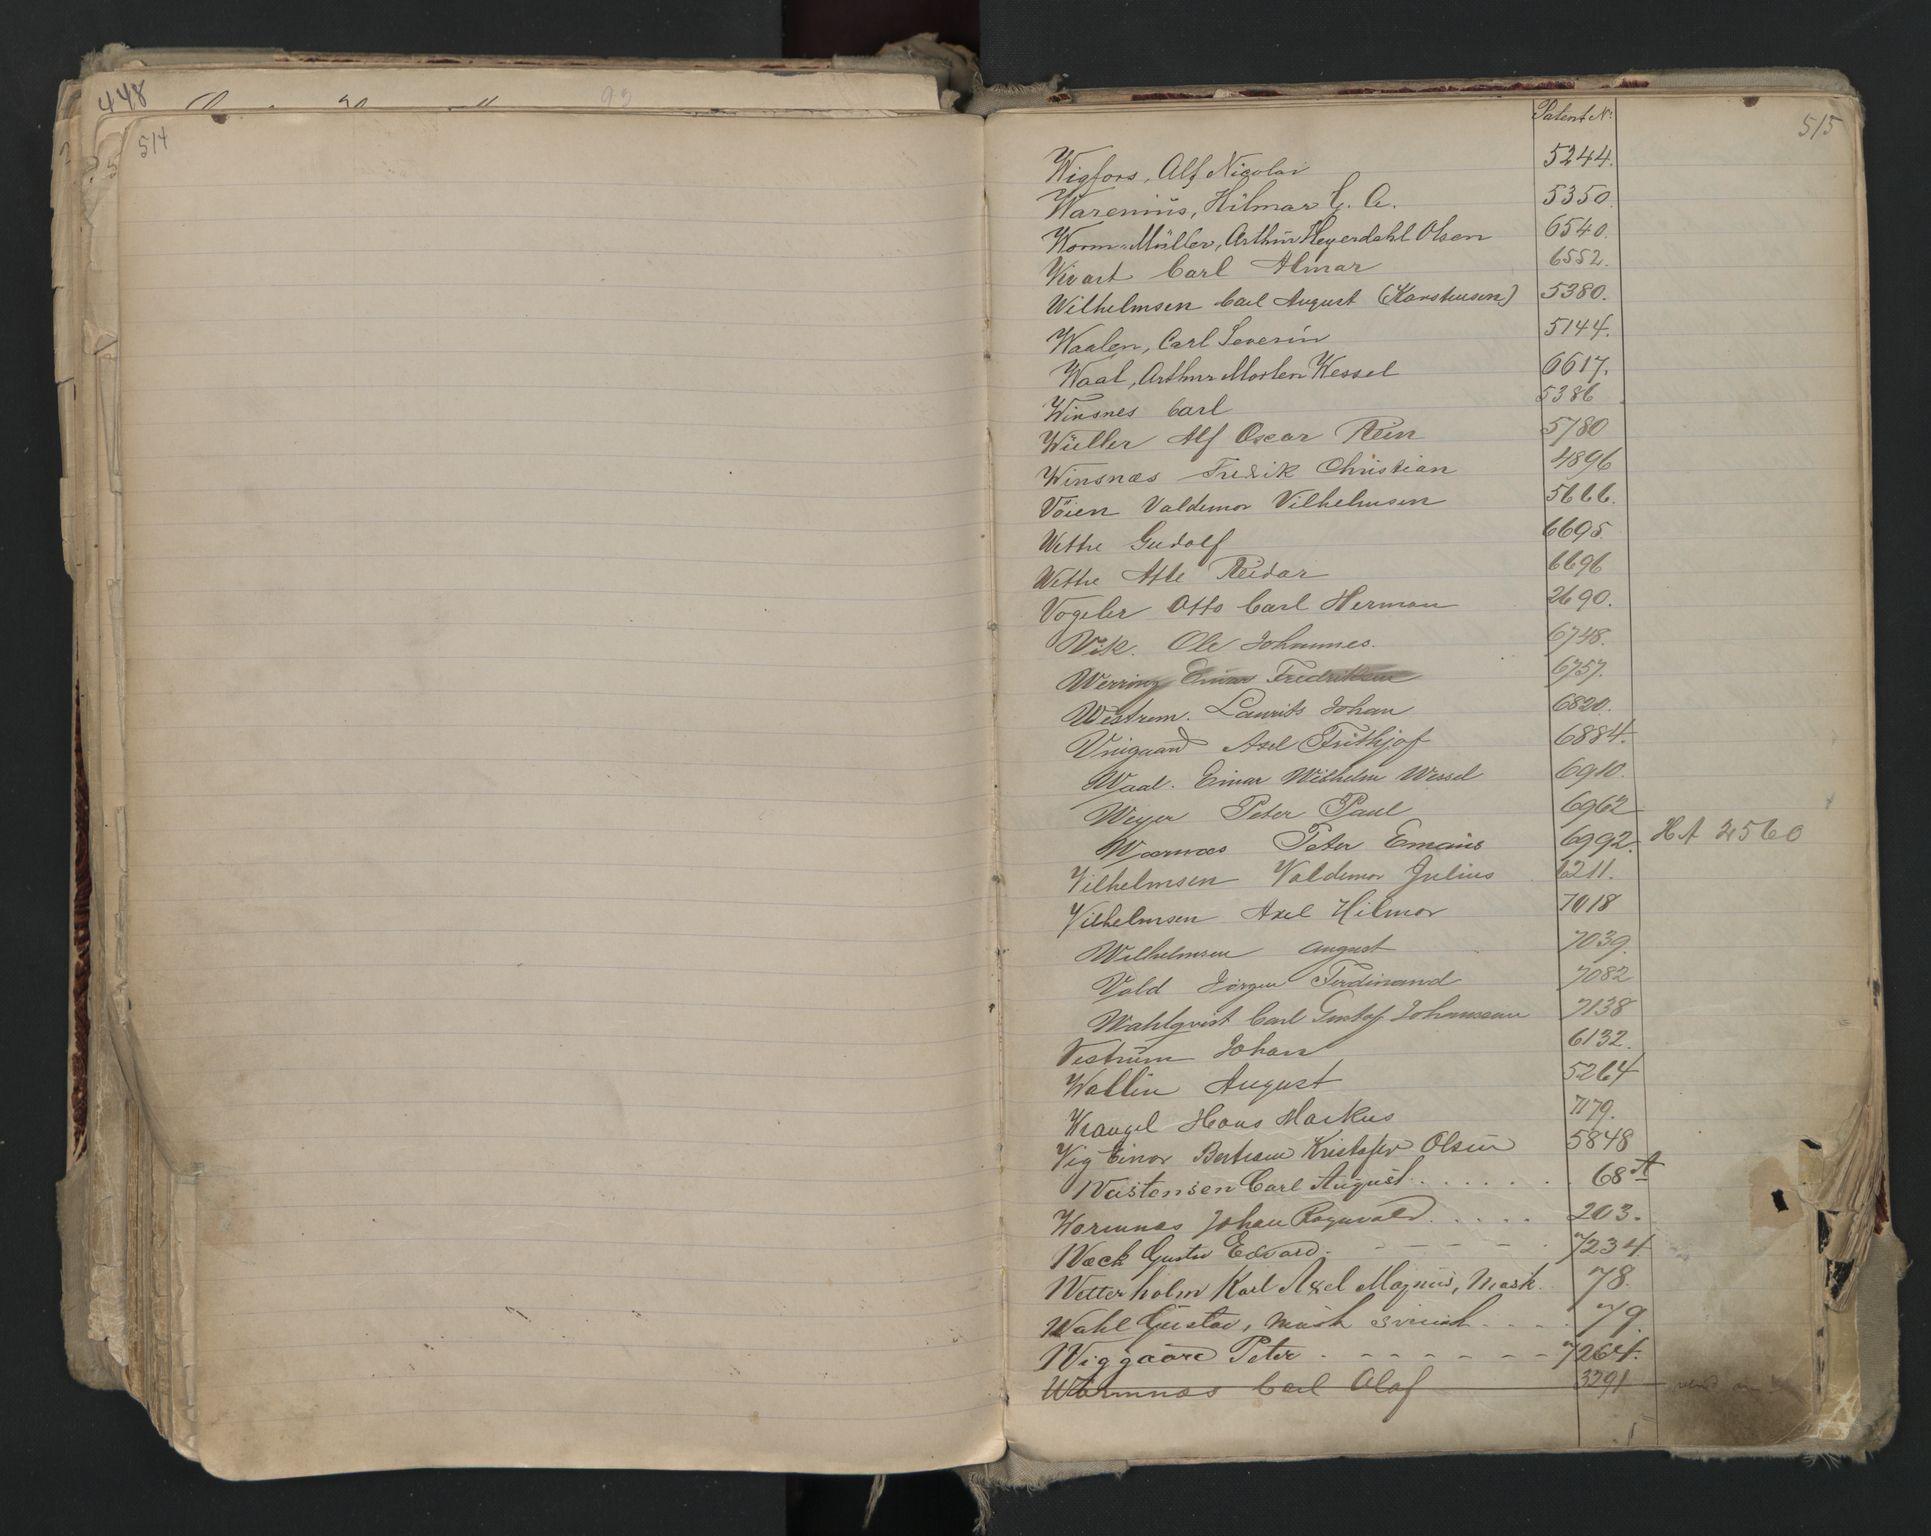 SAO, Oslo sjømannskontor, F/Fa/L0002: Register for Kristiania krets, 1866-1930, s. 514-515